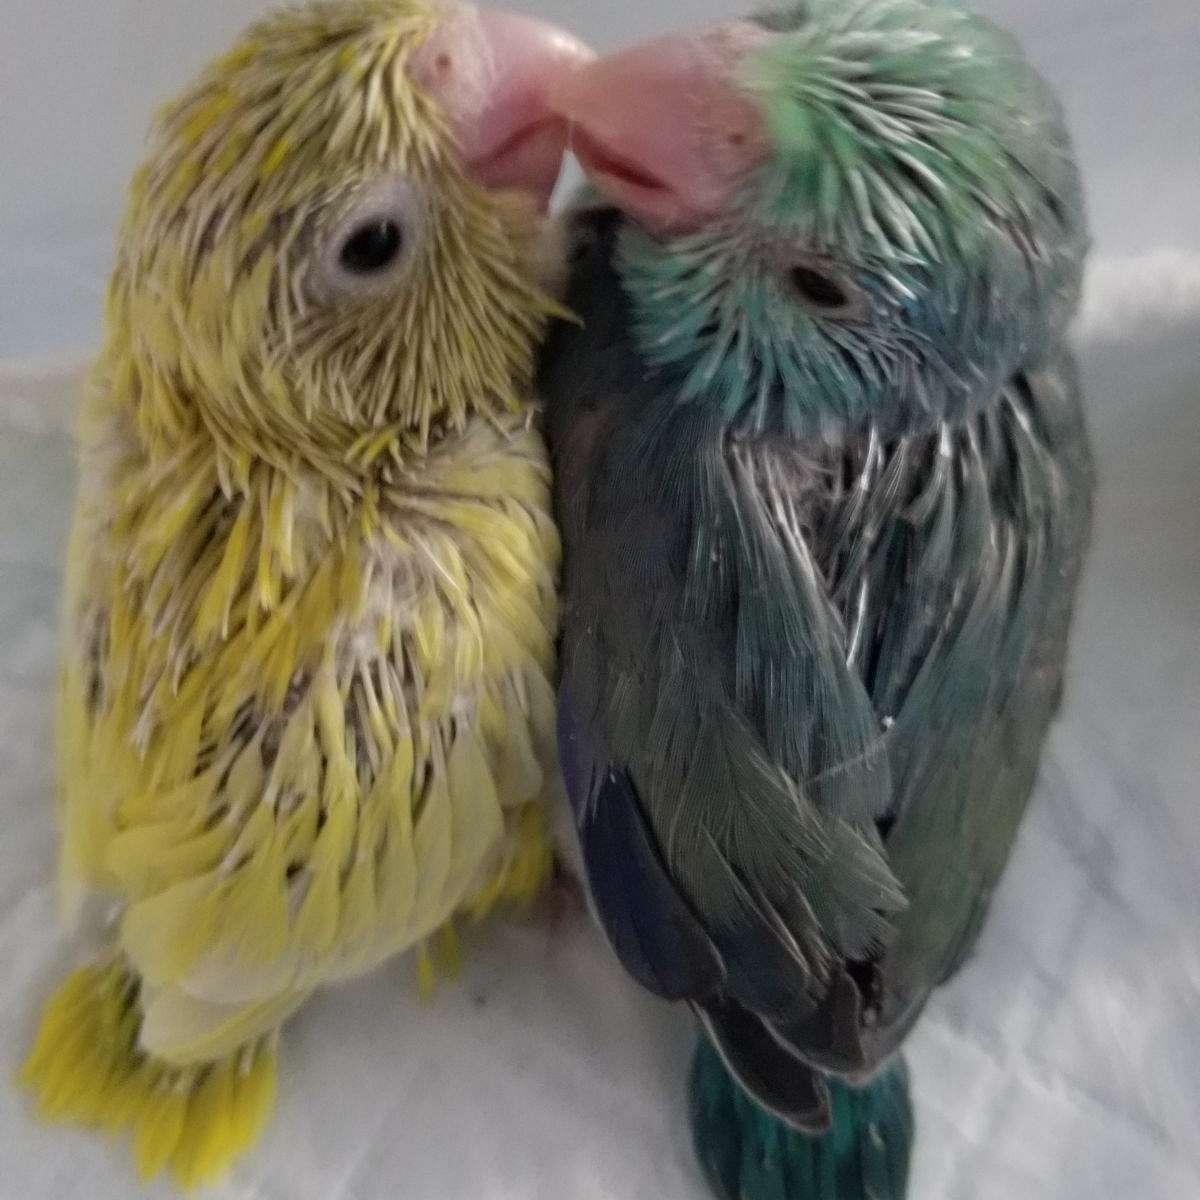 Noble's Sweet Little Tweets Aviary